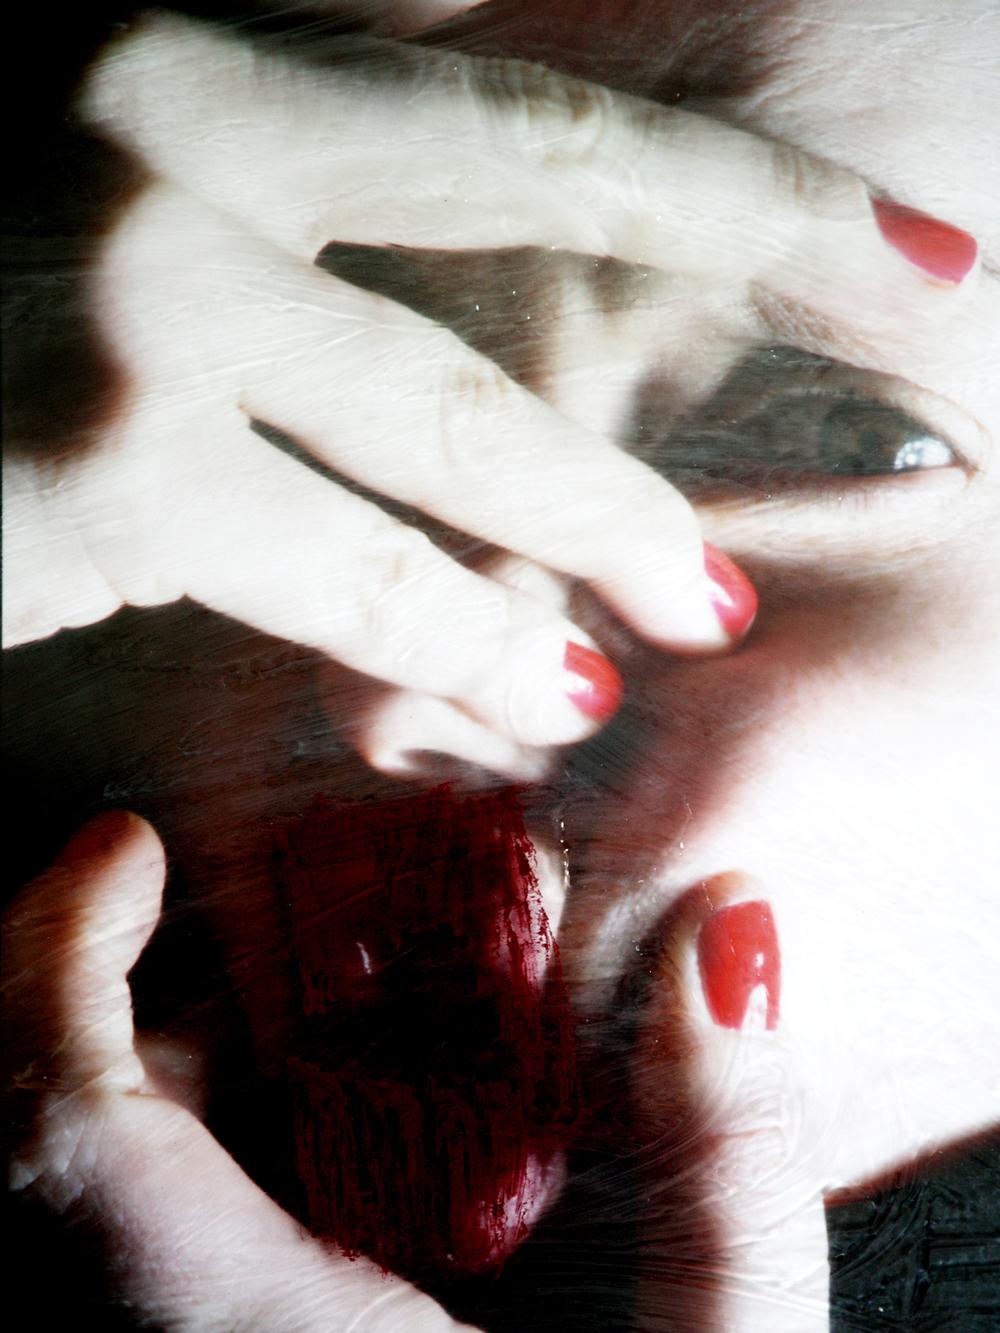 meyousexfriendwant #3  , self-portrait, lambda print, 60 cm x 80 cm, 2007